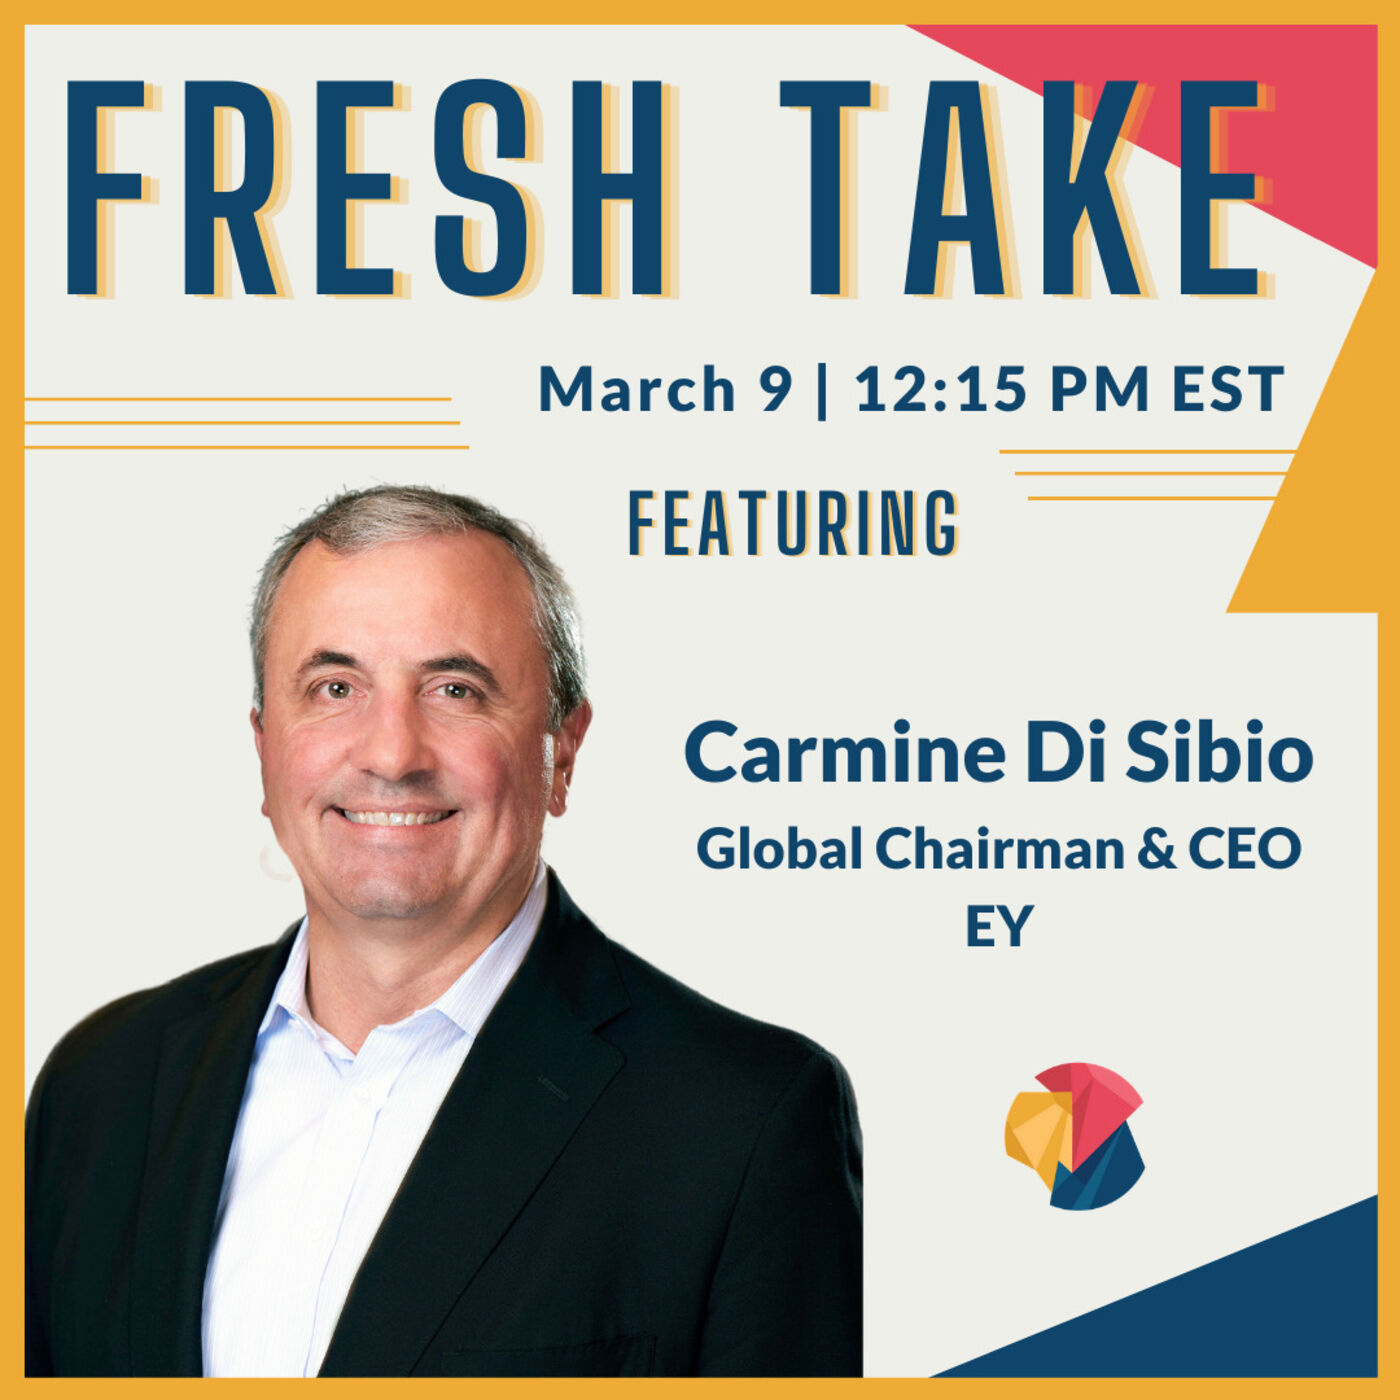 Fresh Take ft. Carmine Di Sibio